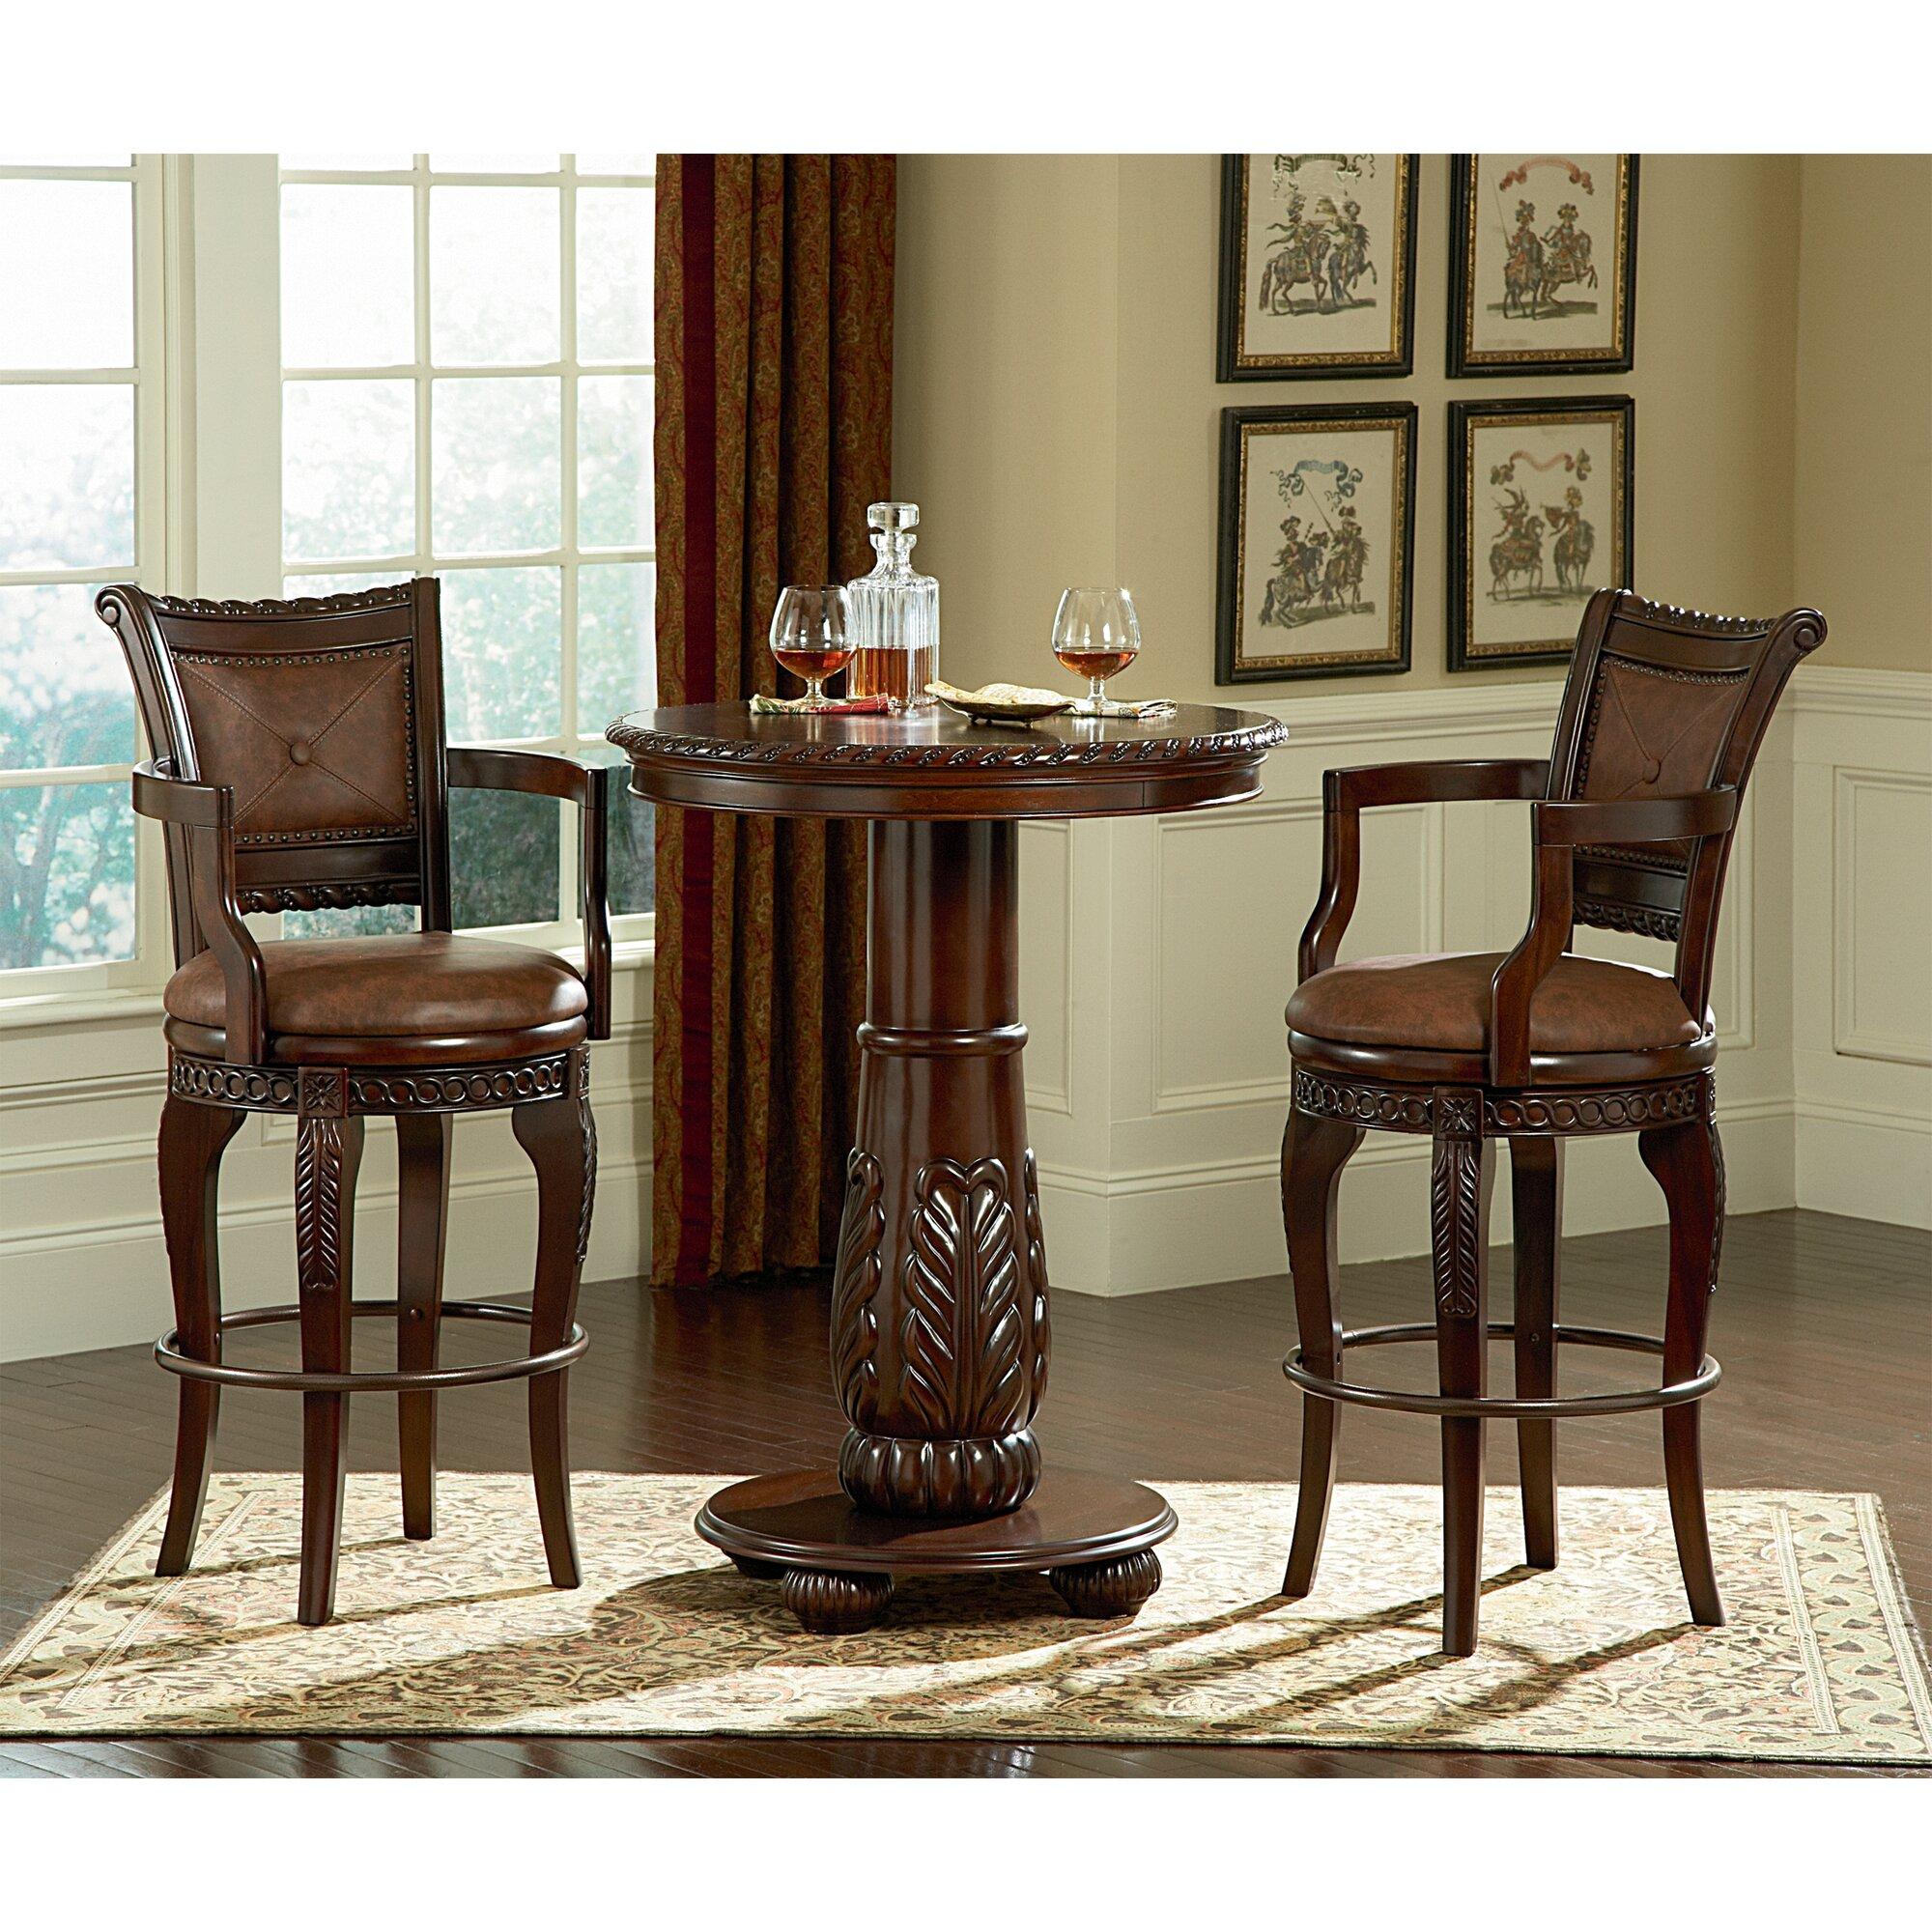 Steve Silver Furniture Antoinette Pub Table Set Reviews Wayfair